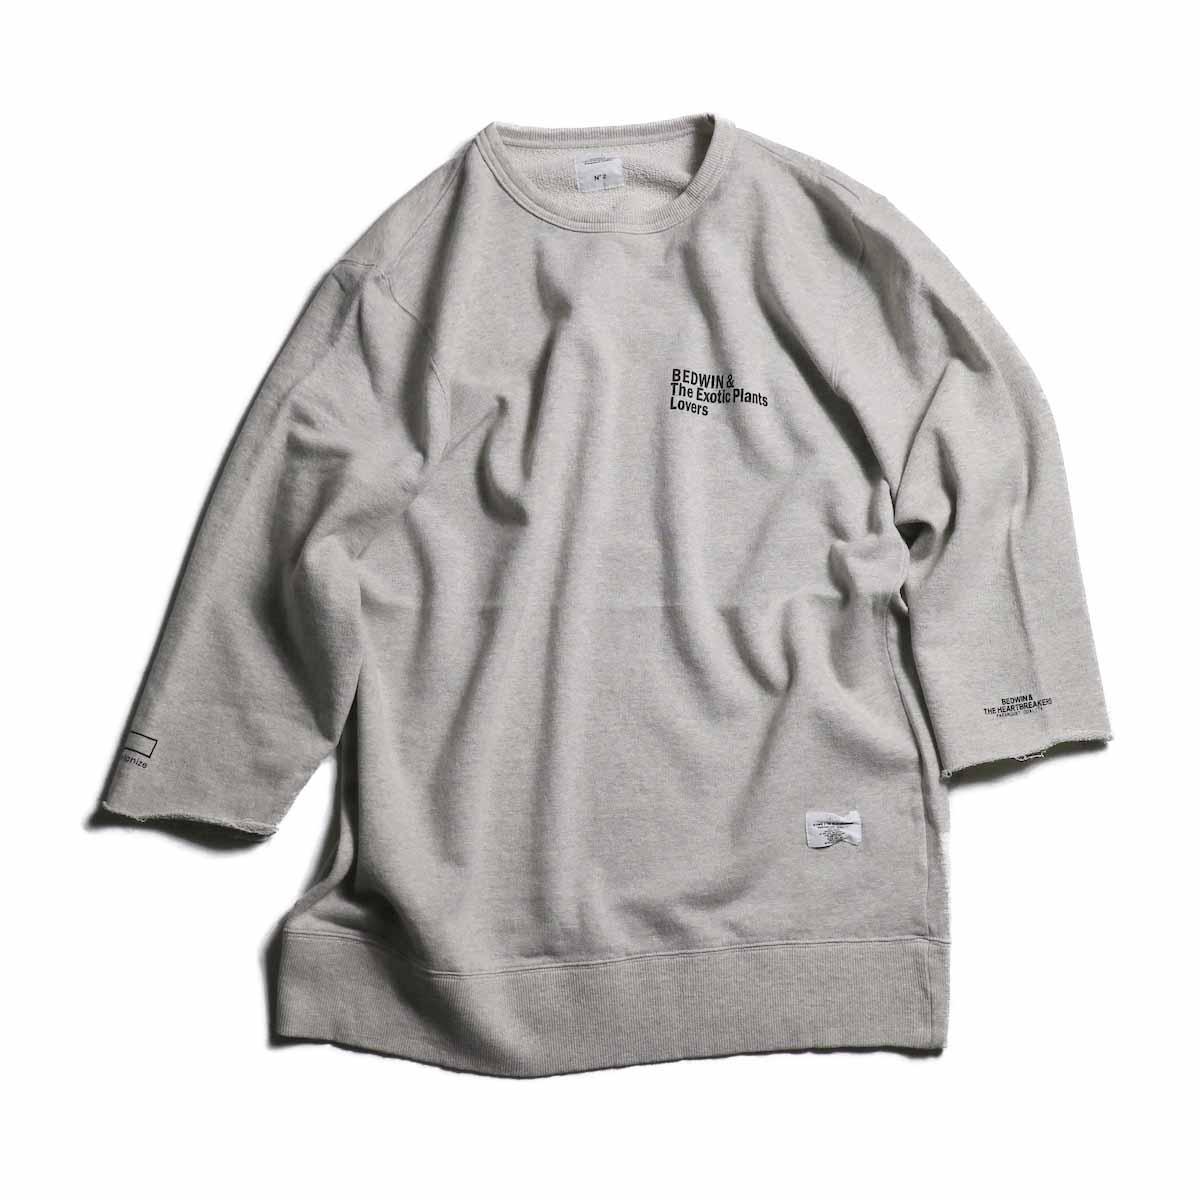 BEDWIN & THE HEARTBREAKERS × BOTANIZE / 3/4 Sleeve Sweat Tee